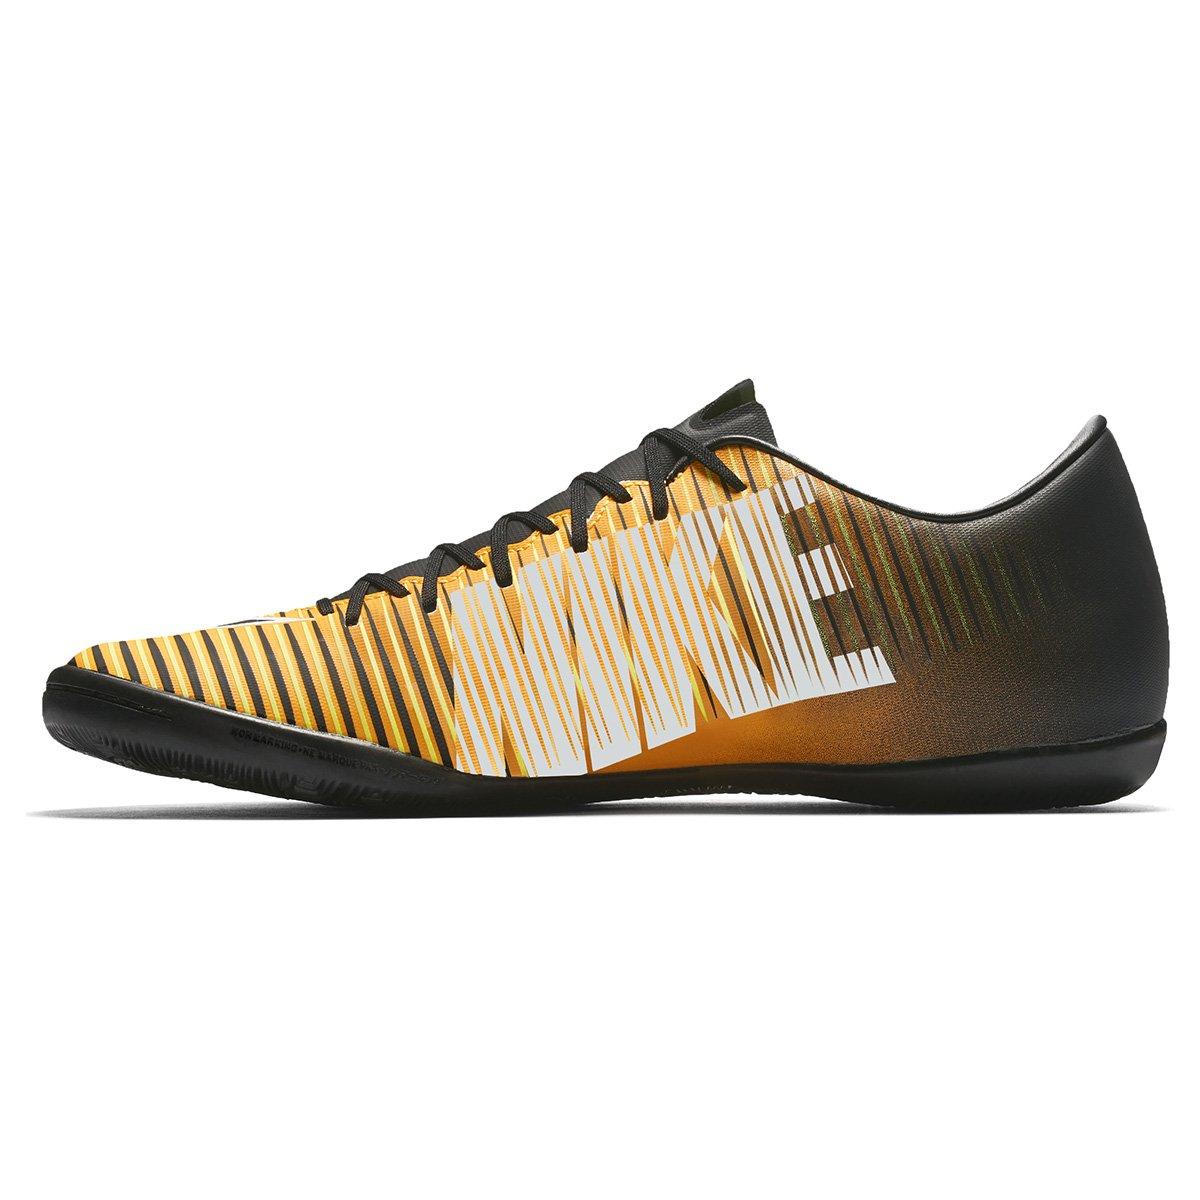 23db3b81e5 Chuteira Futsal Nike Mercurial Victory 6 IC - Preto e Laranja ...